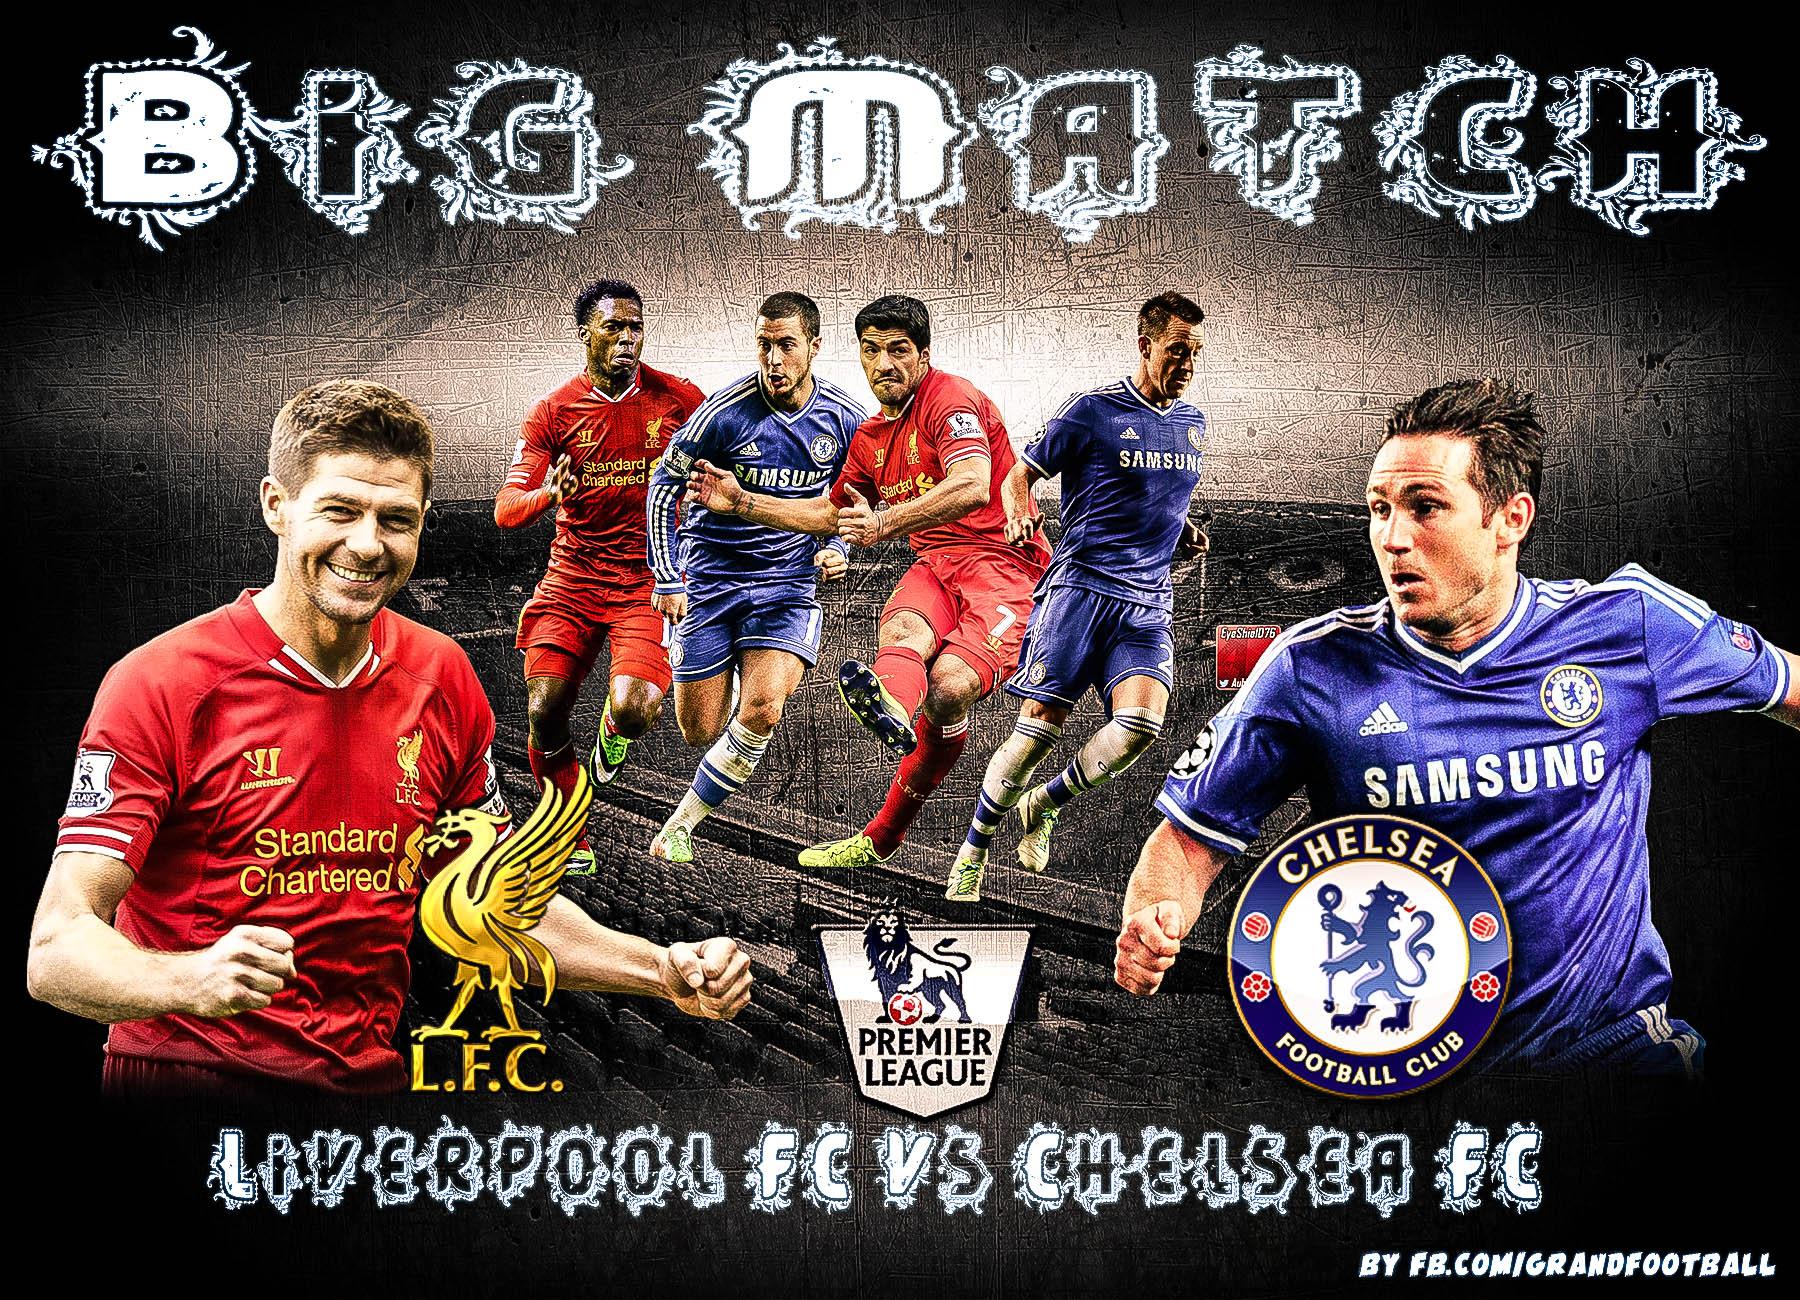 Chelsea Vs Liverpool 2014: Liverpool FC Vs Chelsea FC By Lionelkhouya On DeviantArt